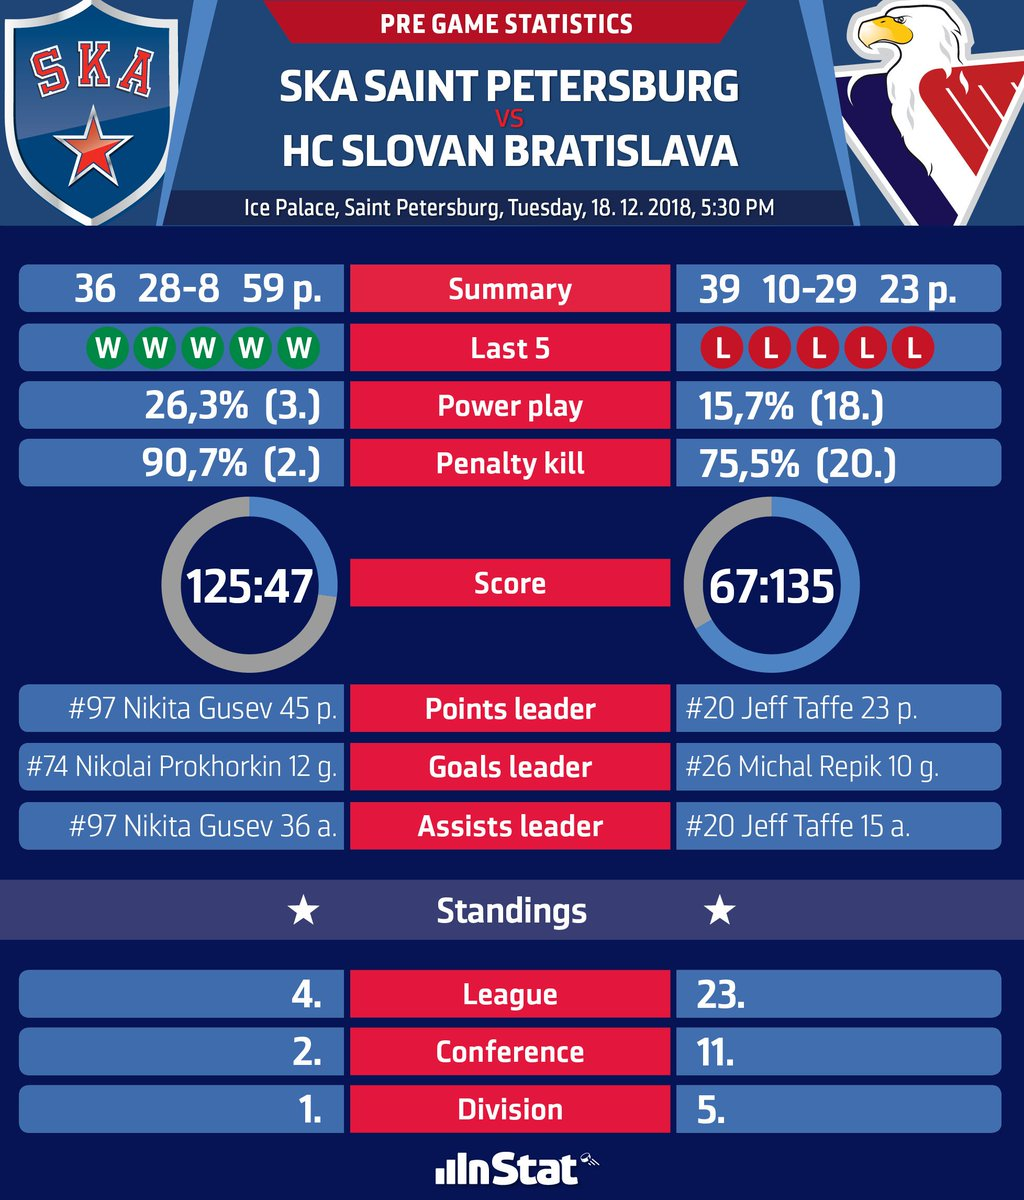 Pregame stats and match up info @hcSKA vs #hcslovan. Face off time 5:30 PM CET. @khl @khlmediateam #VerniSlovanu https://t.co/JTc7JC1WKr